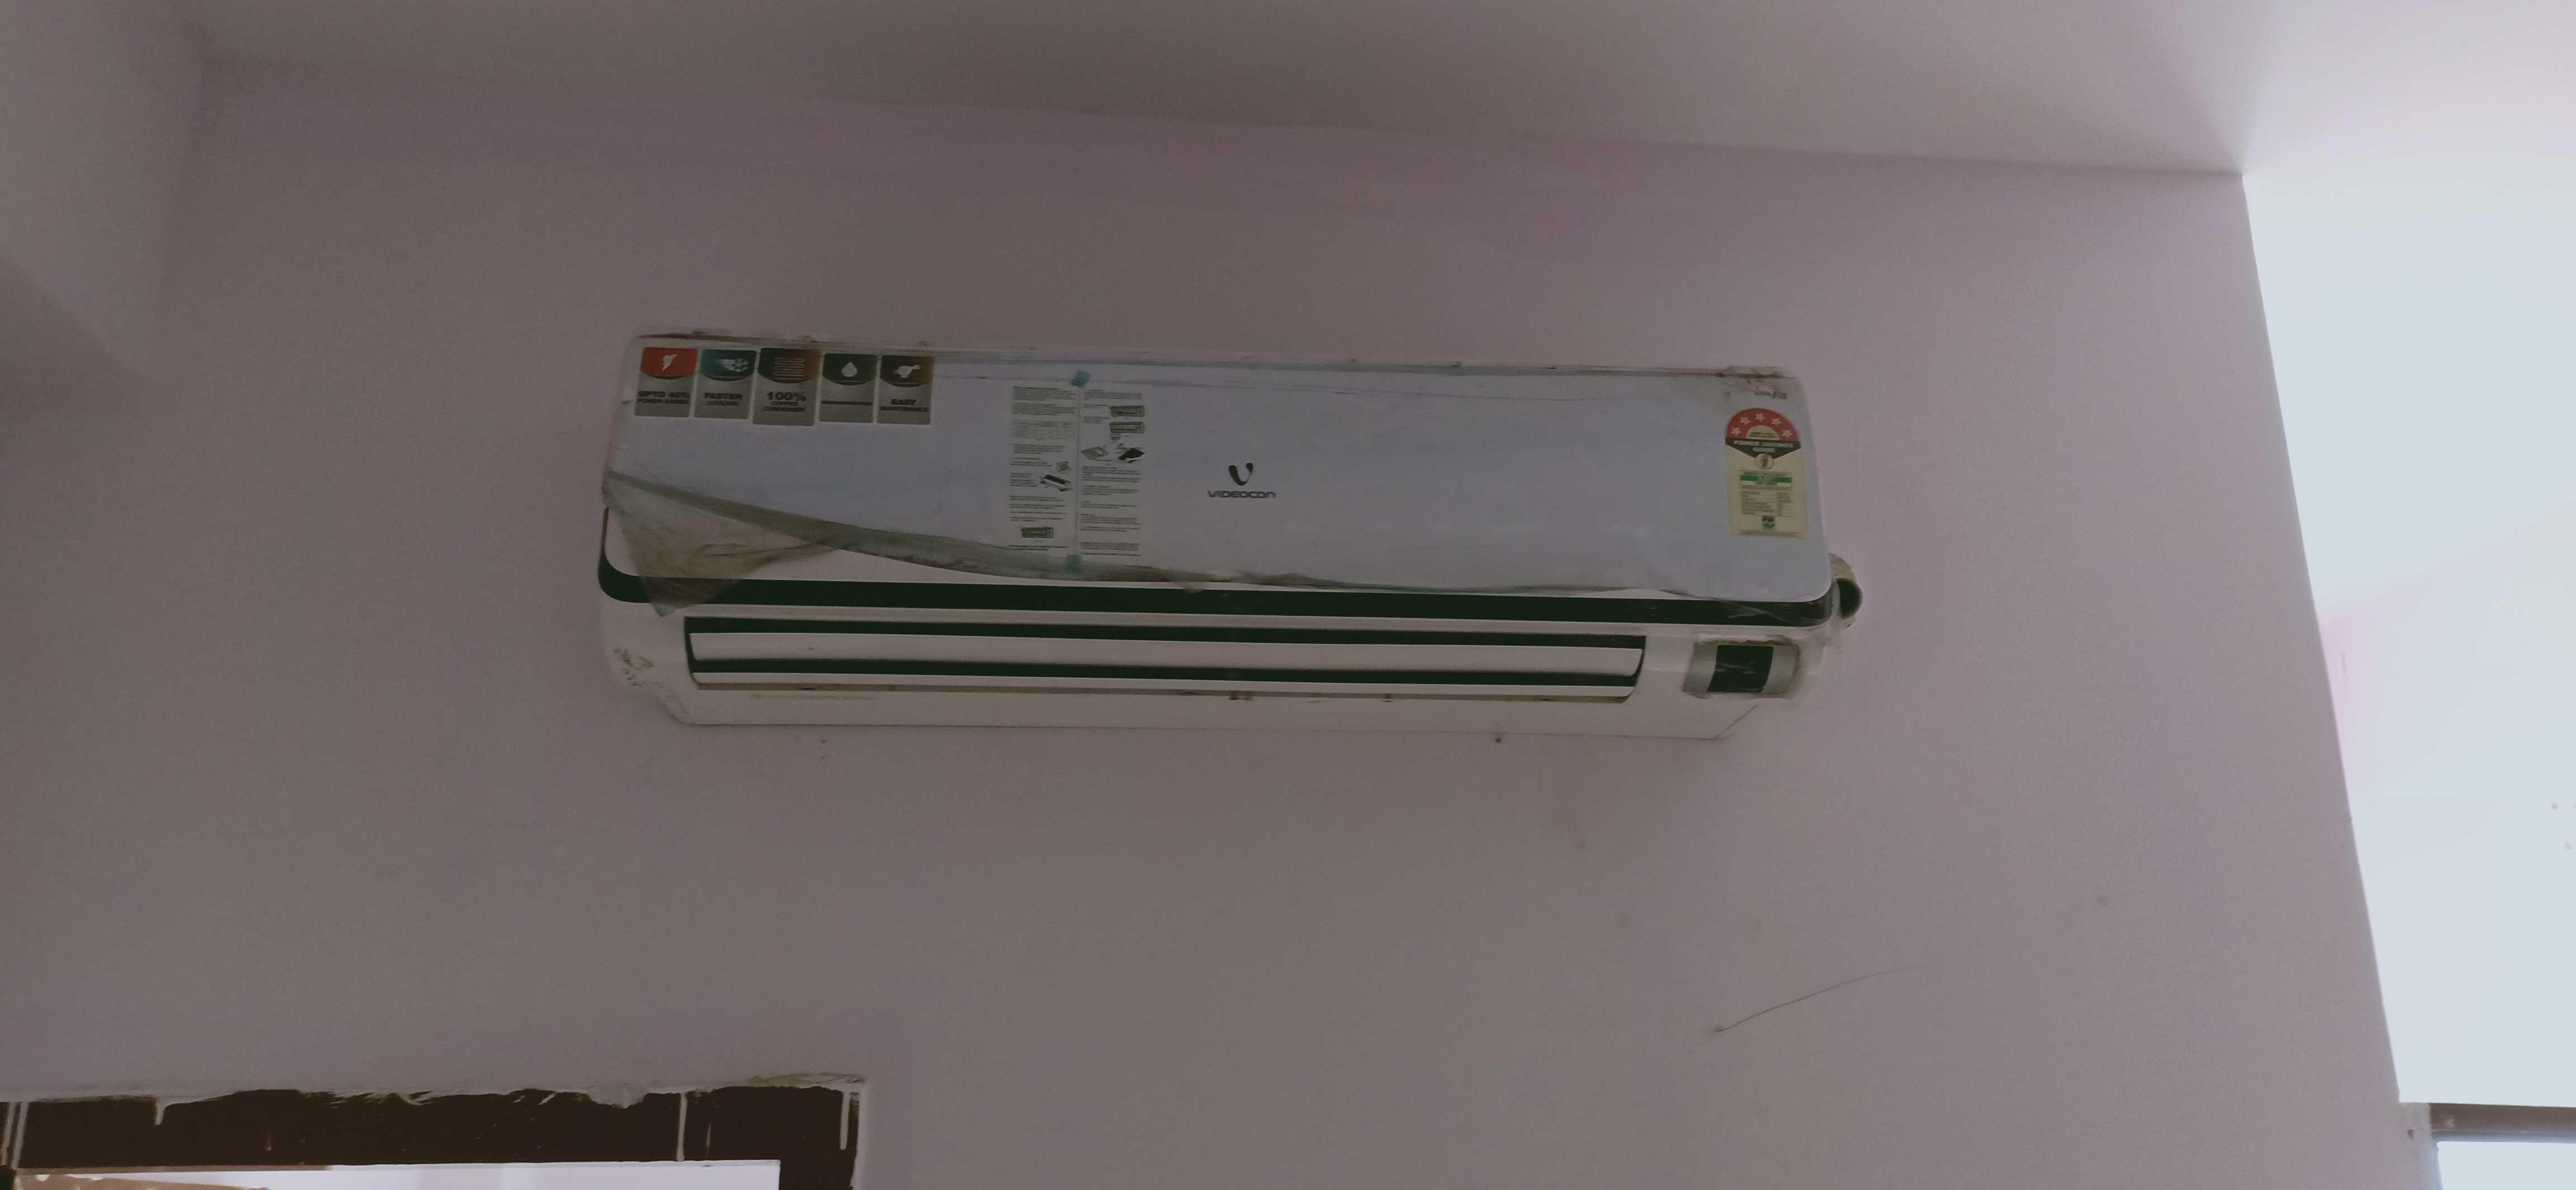 AC Repair Services in Hyderabad, Air Conditioning Repair